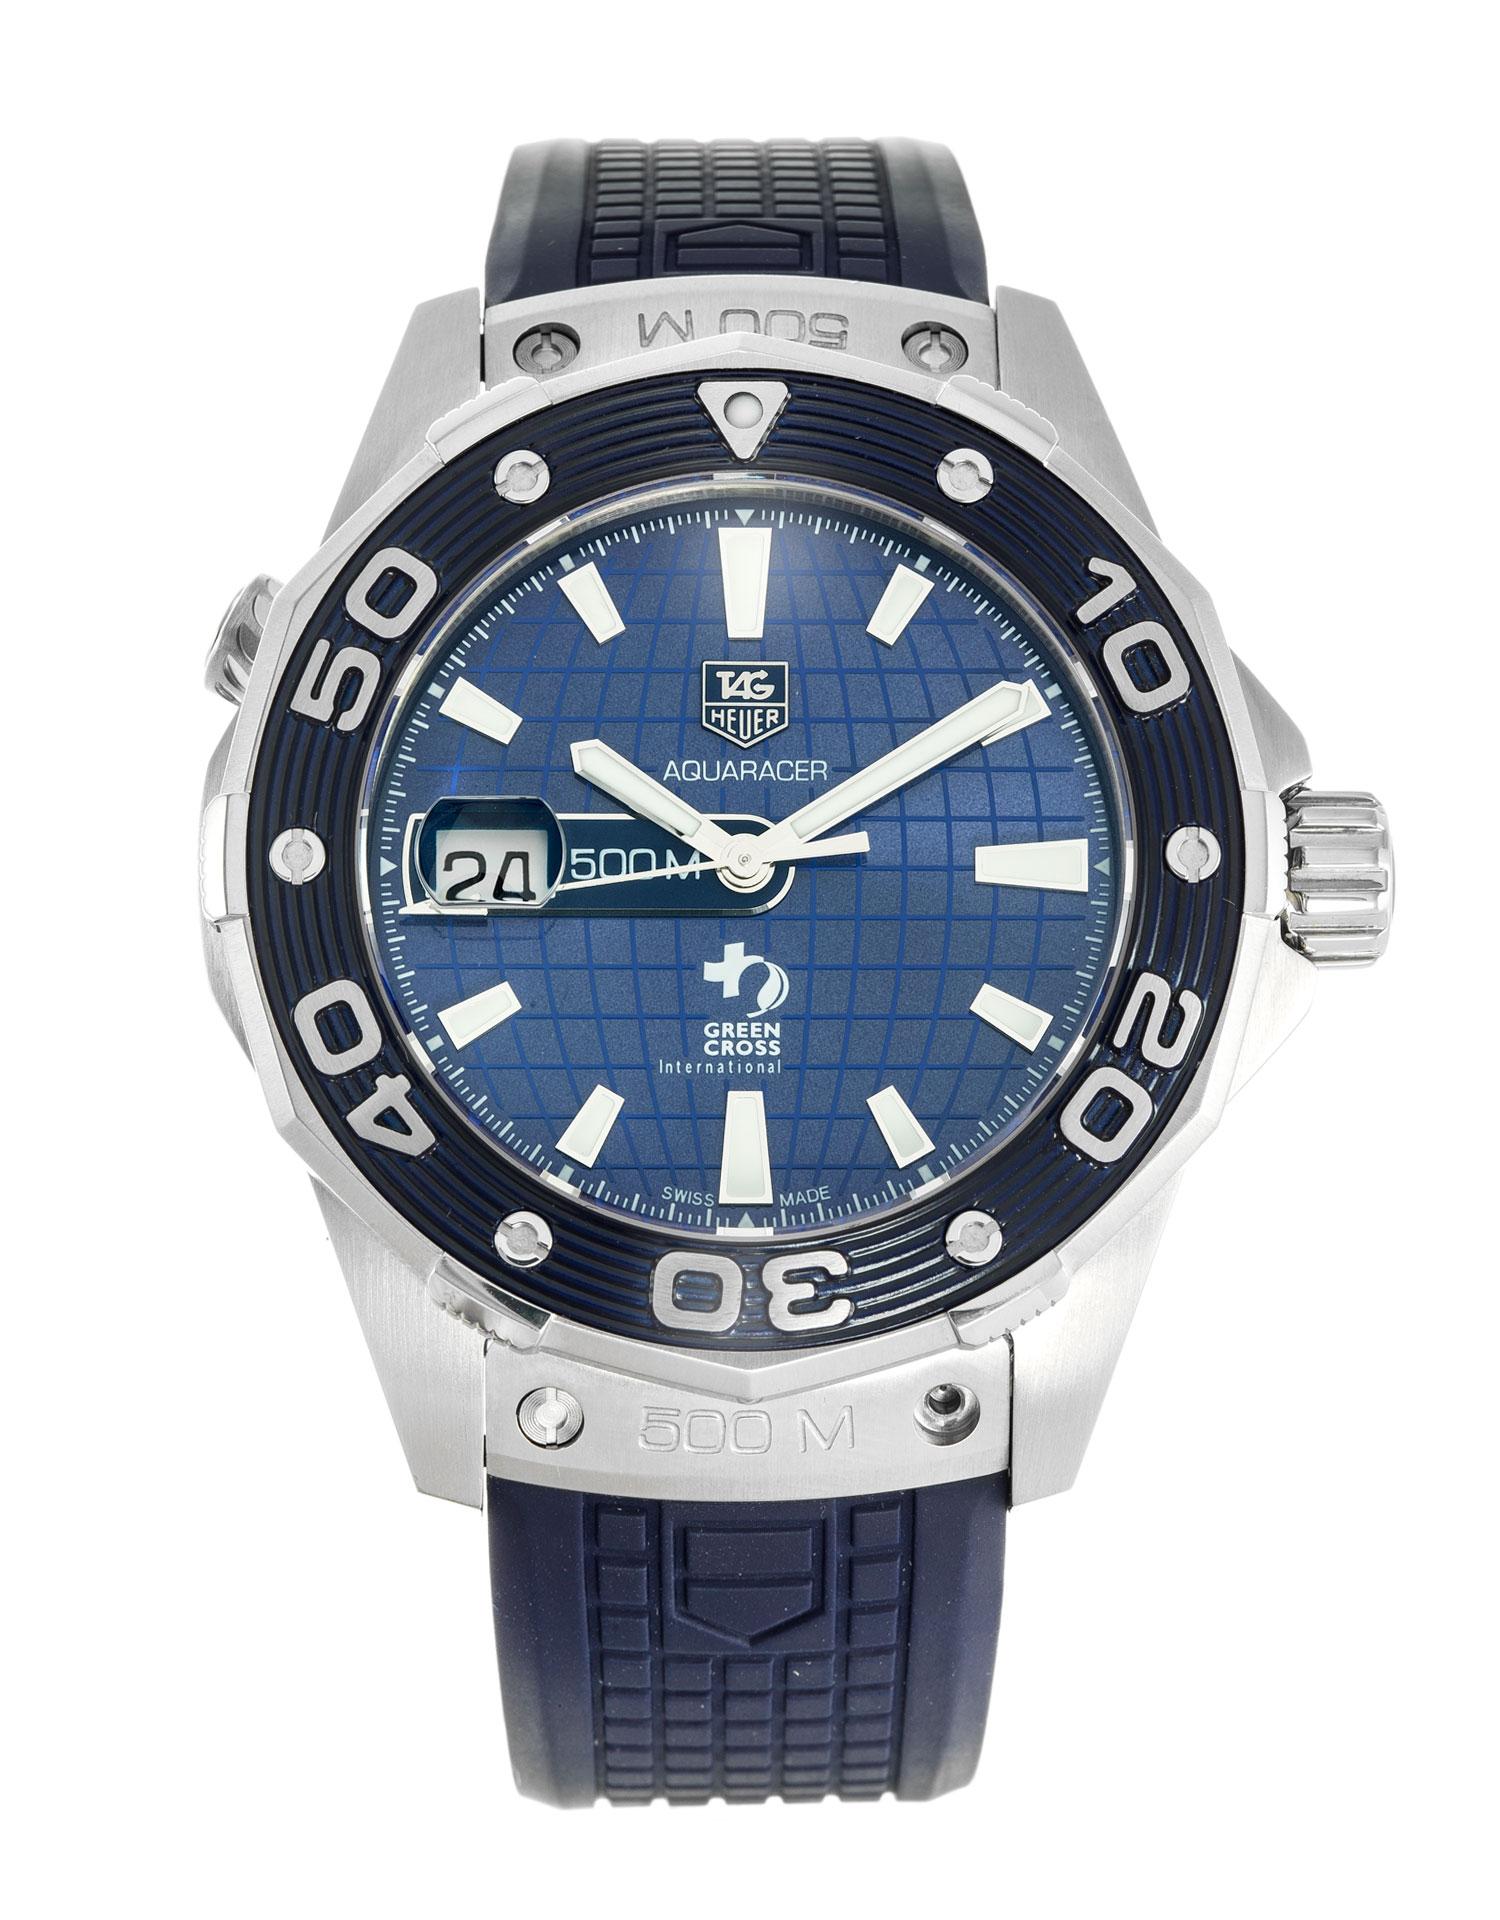 Tag Heuer Aquaracer WAJ2116 FT6022 Watch